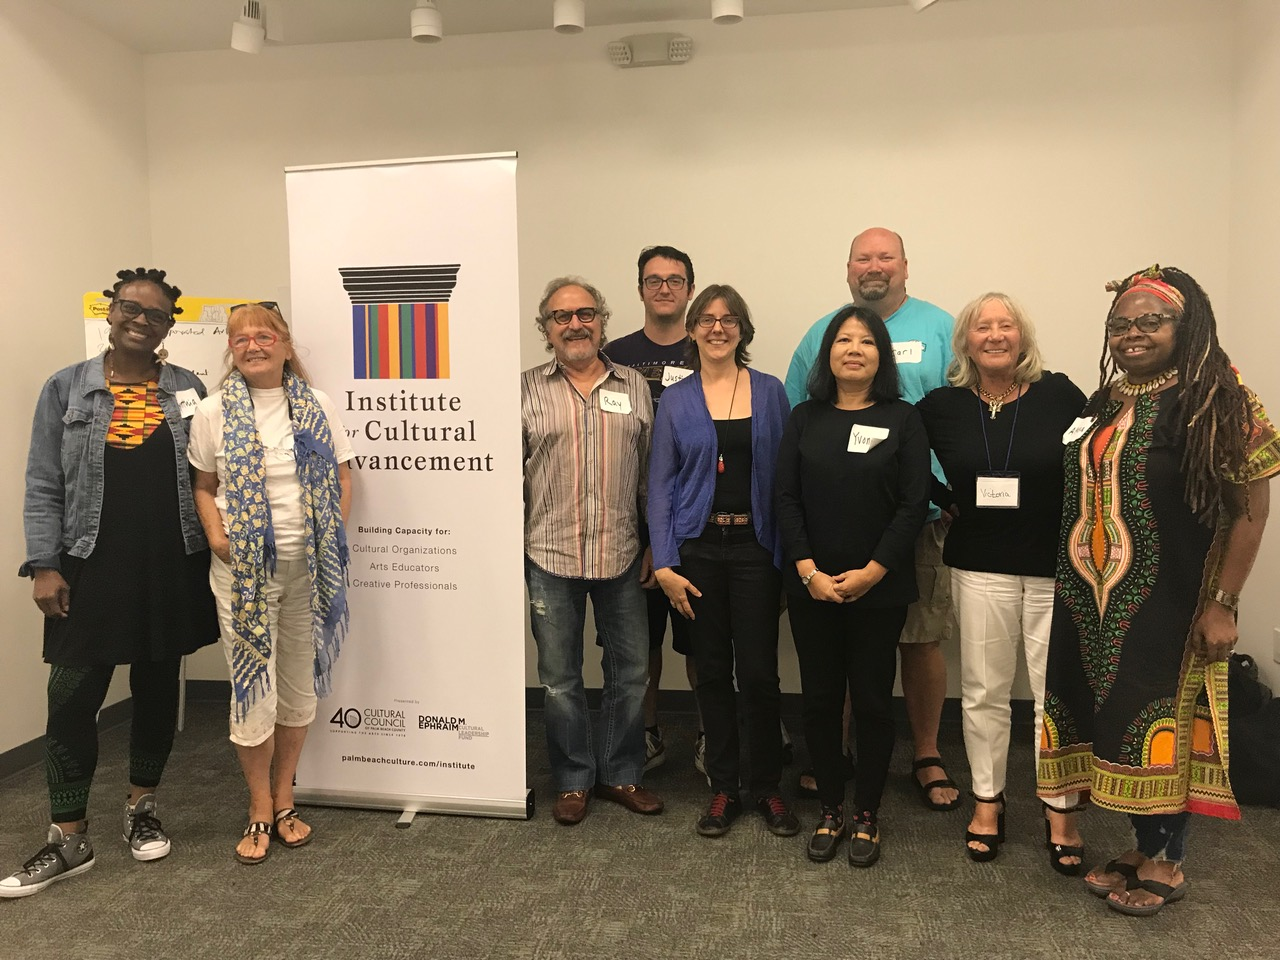 Institute for Cultural Advancement artist workshop